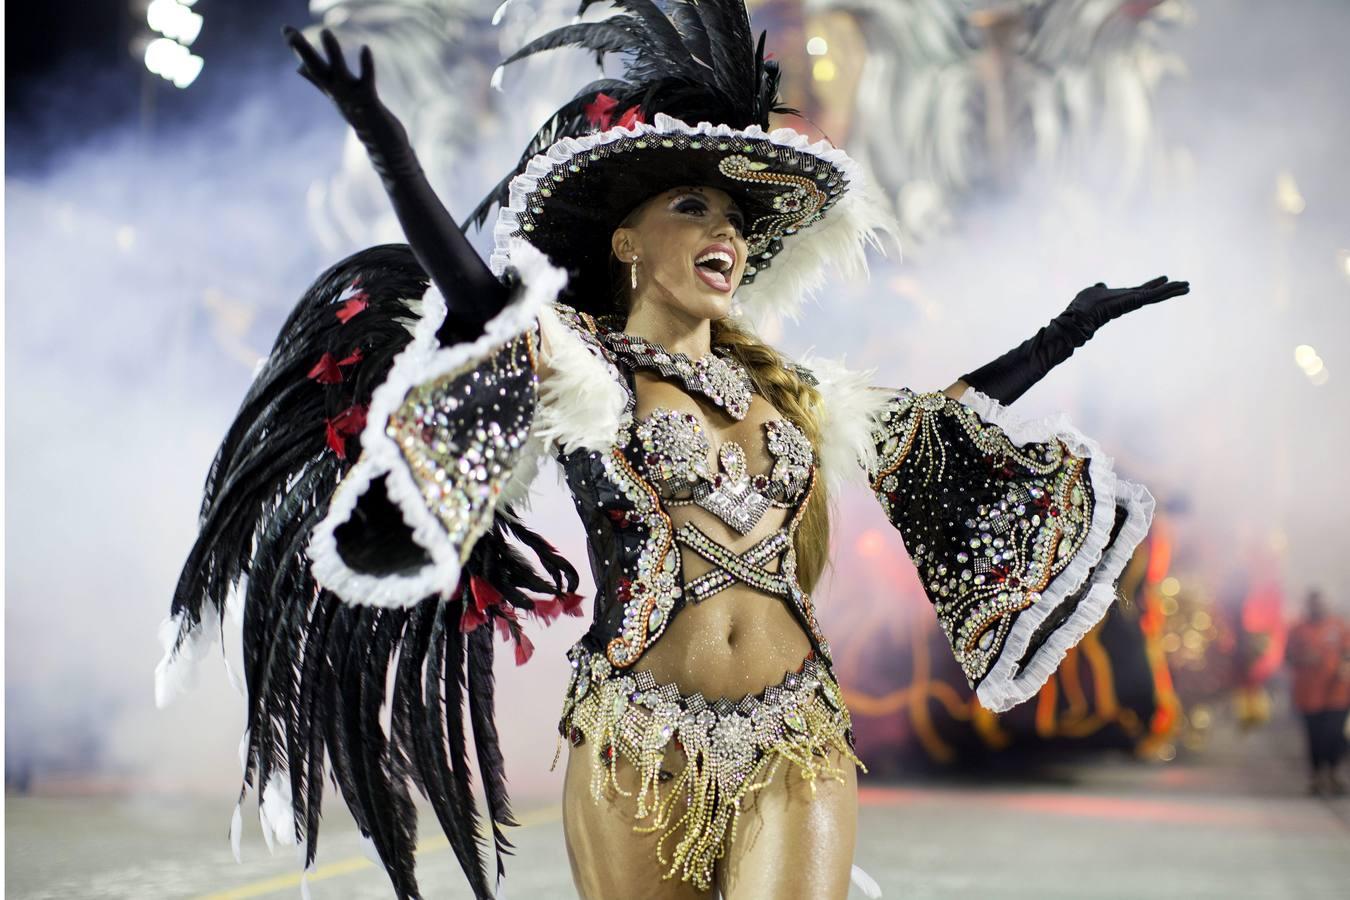 brazilskie-krasavitsi-video-karnaval-samie-seksualnie-porno-zvezdi-s-bolshimi-siskami